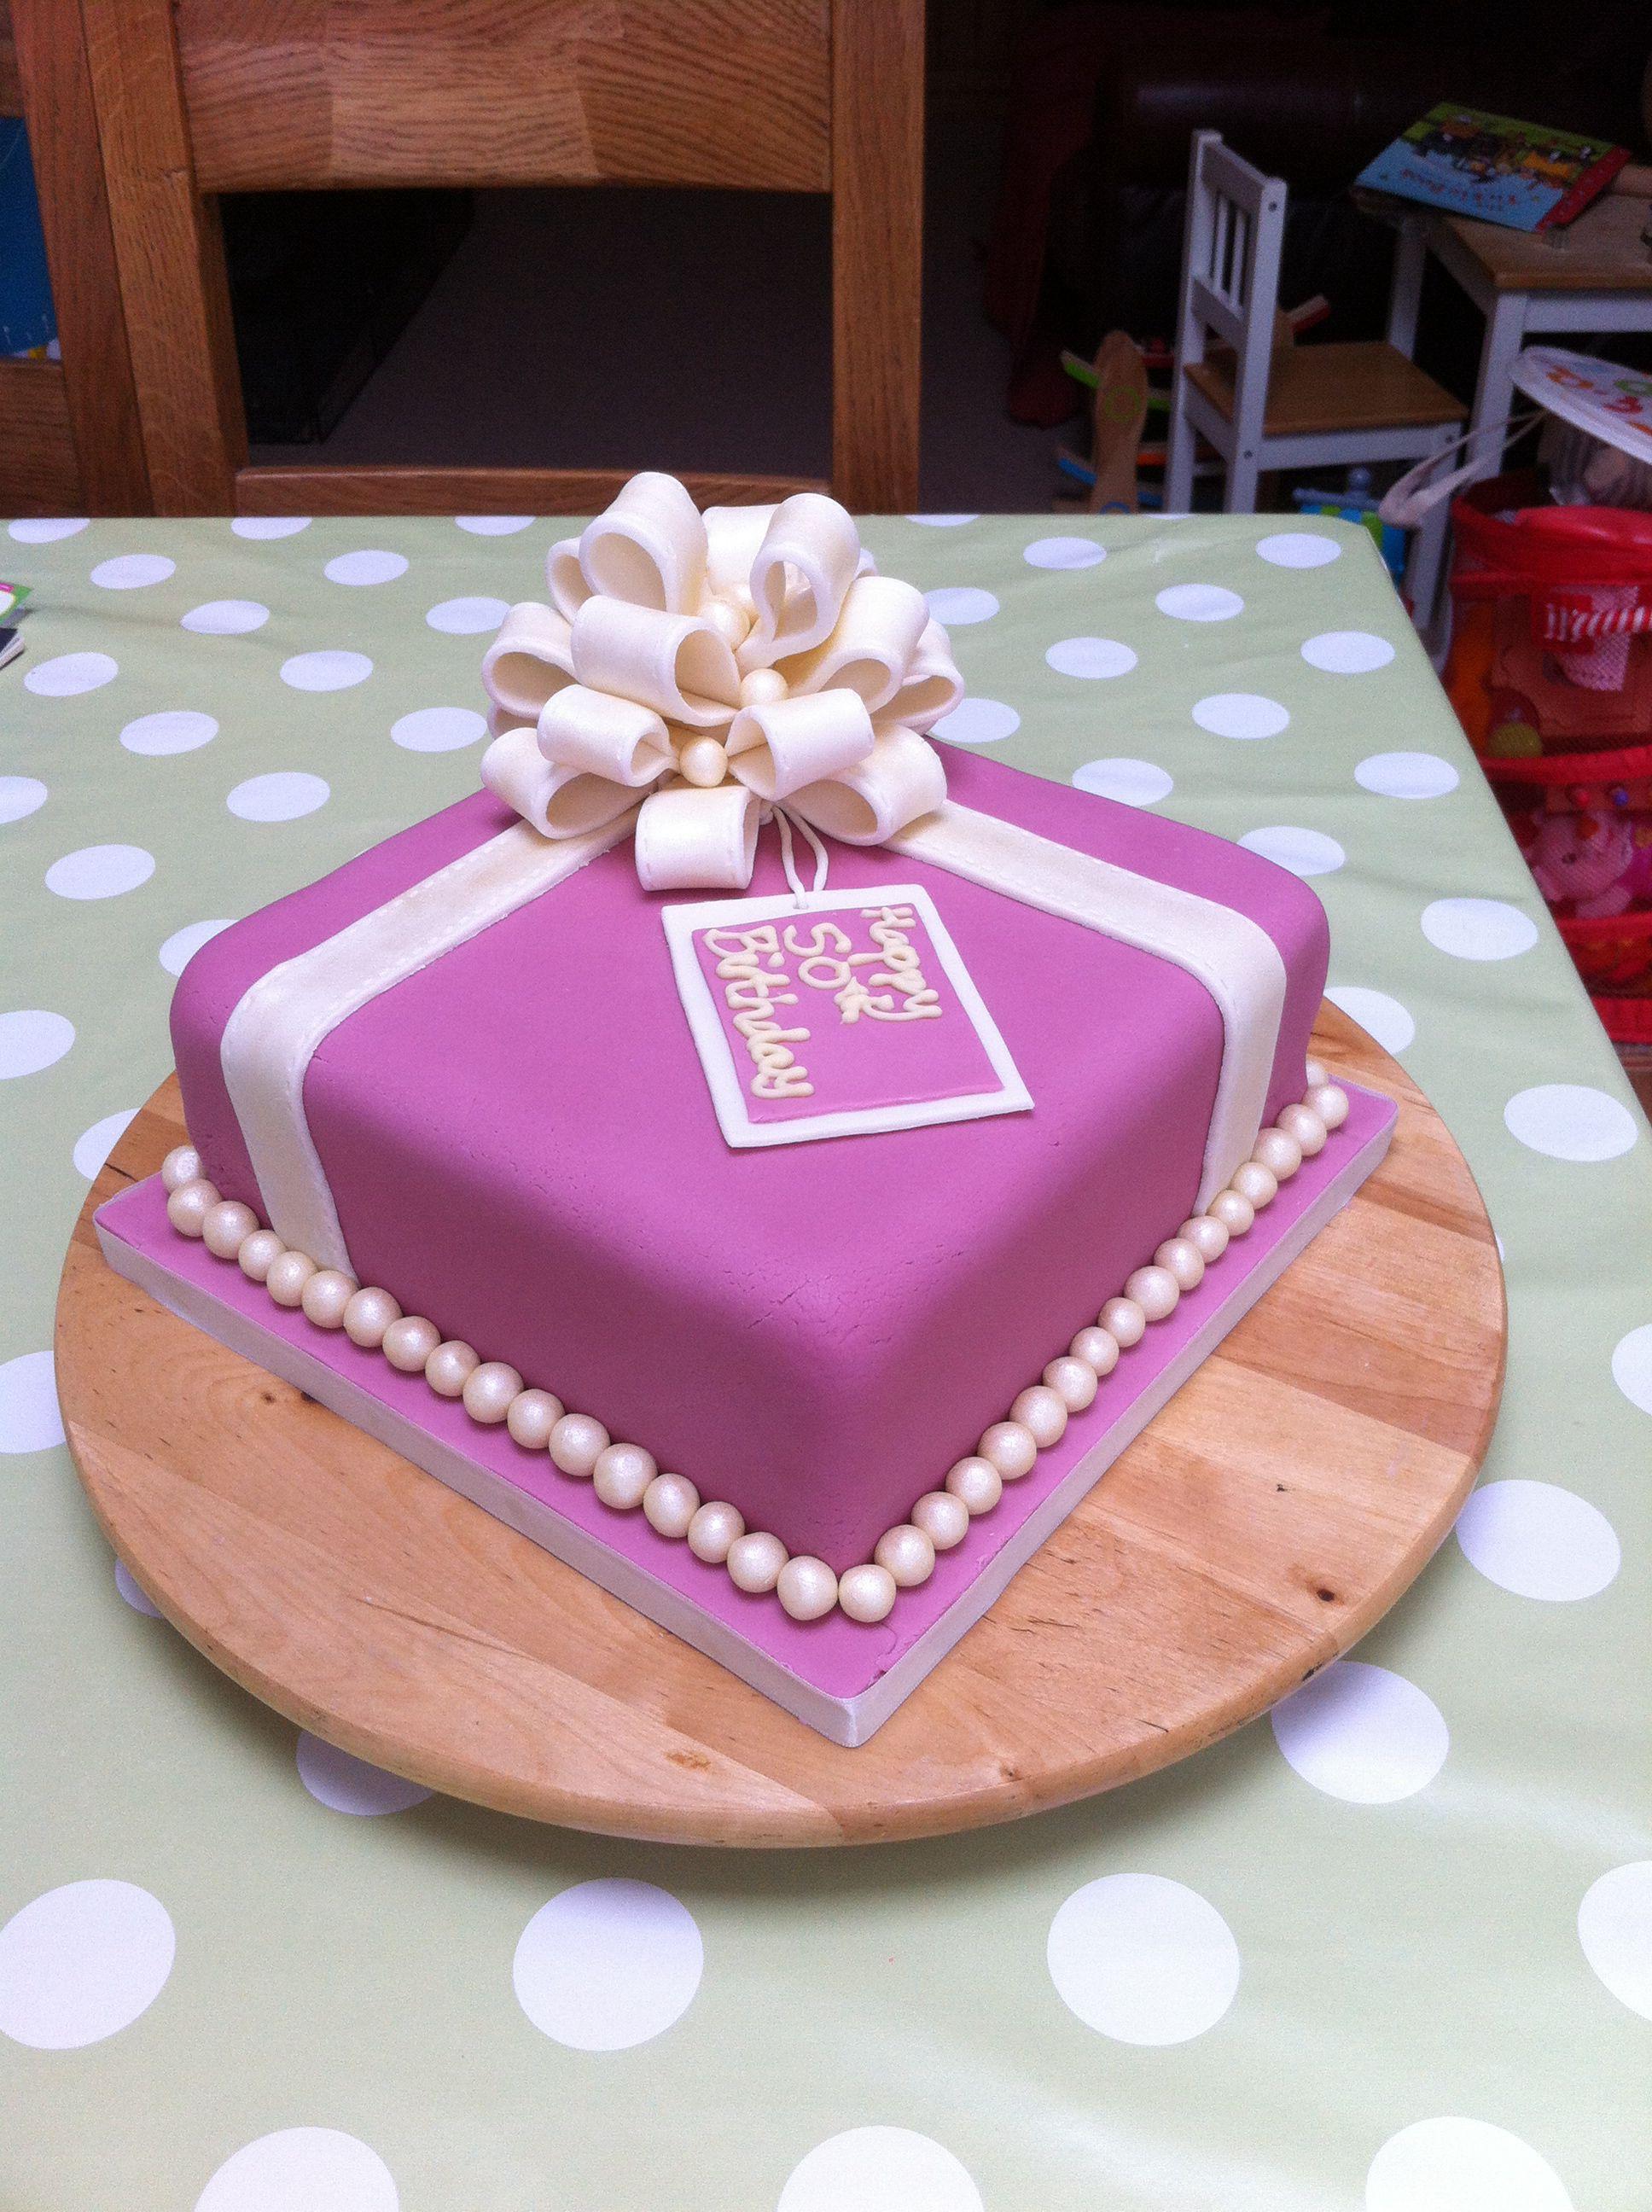 50th birthday cake 50th birthday cake, Fondant cakes